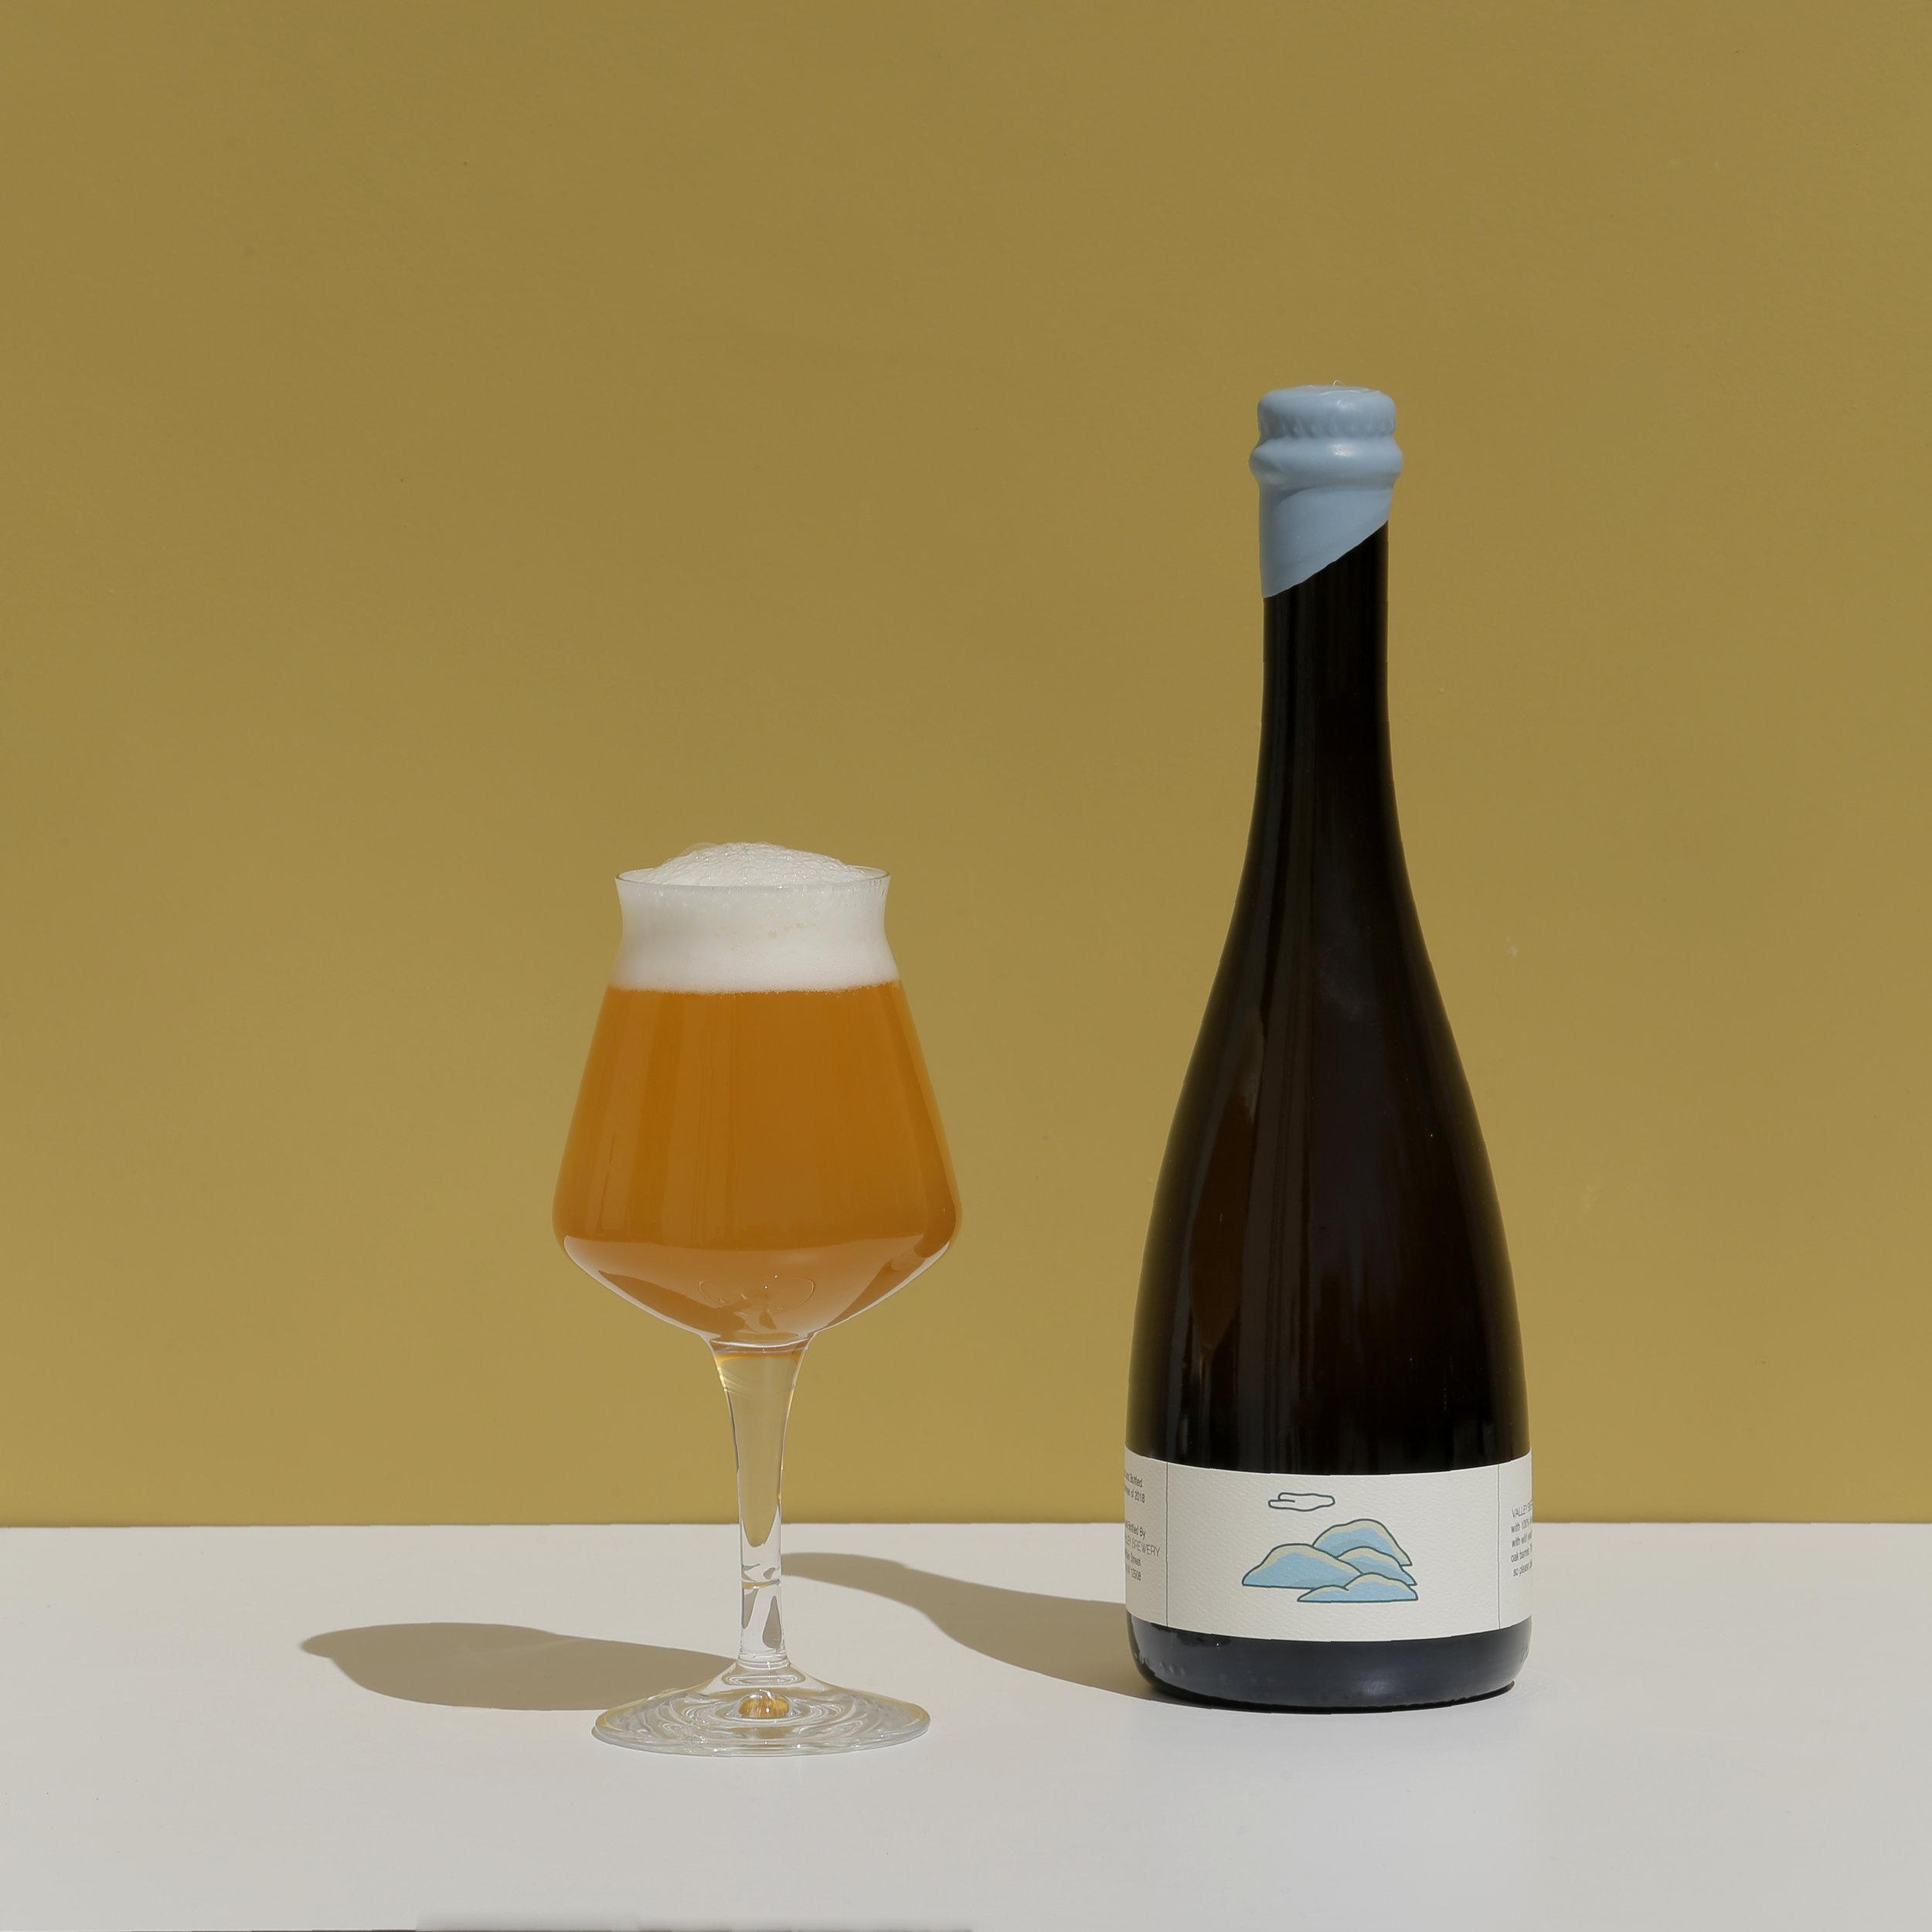 Valley_Beer_Glass.jpg